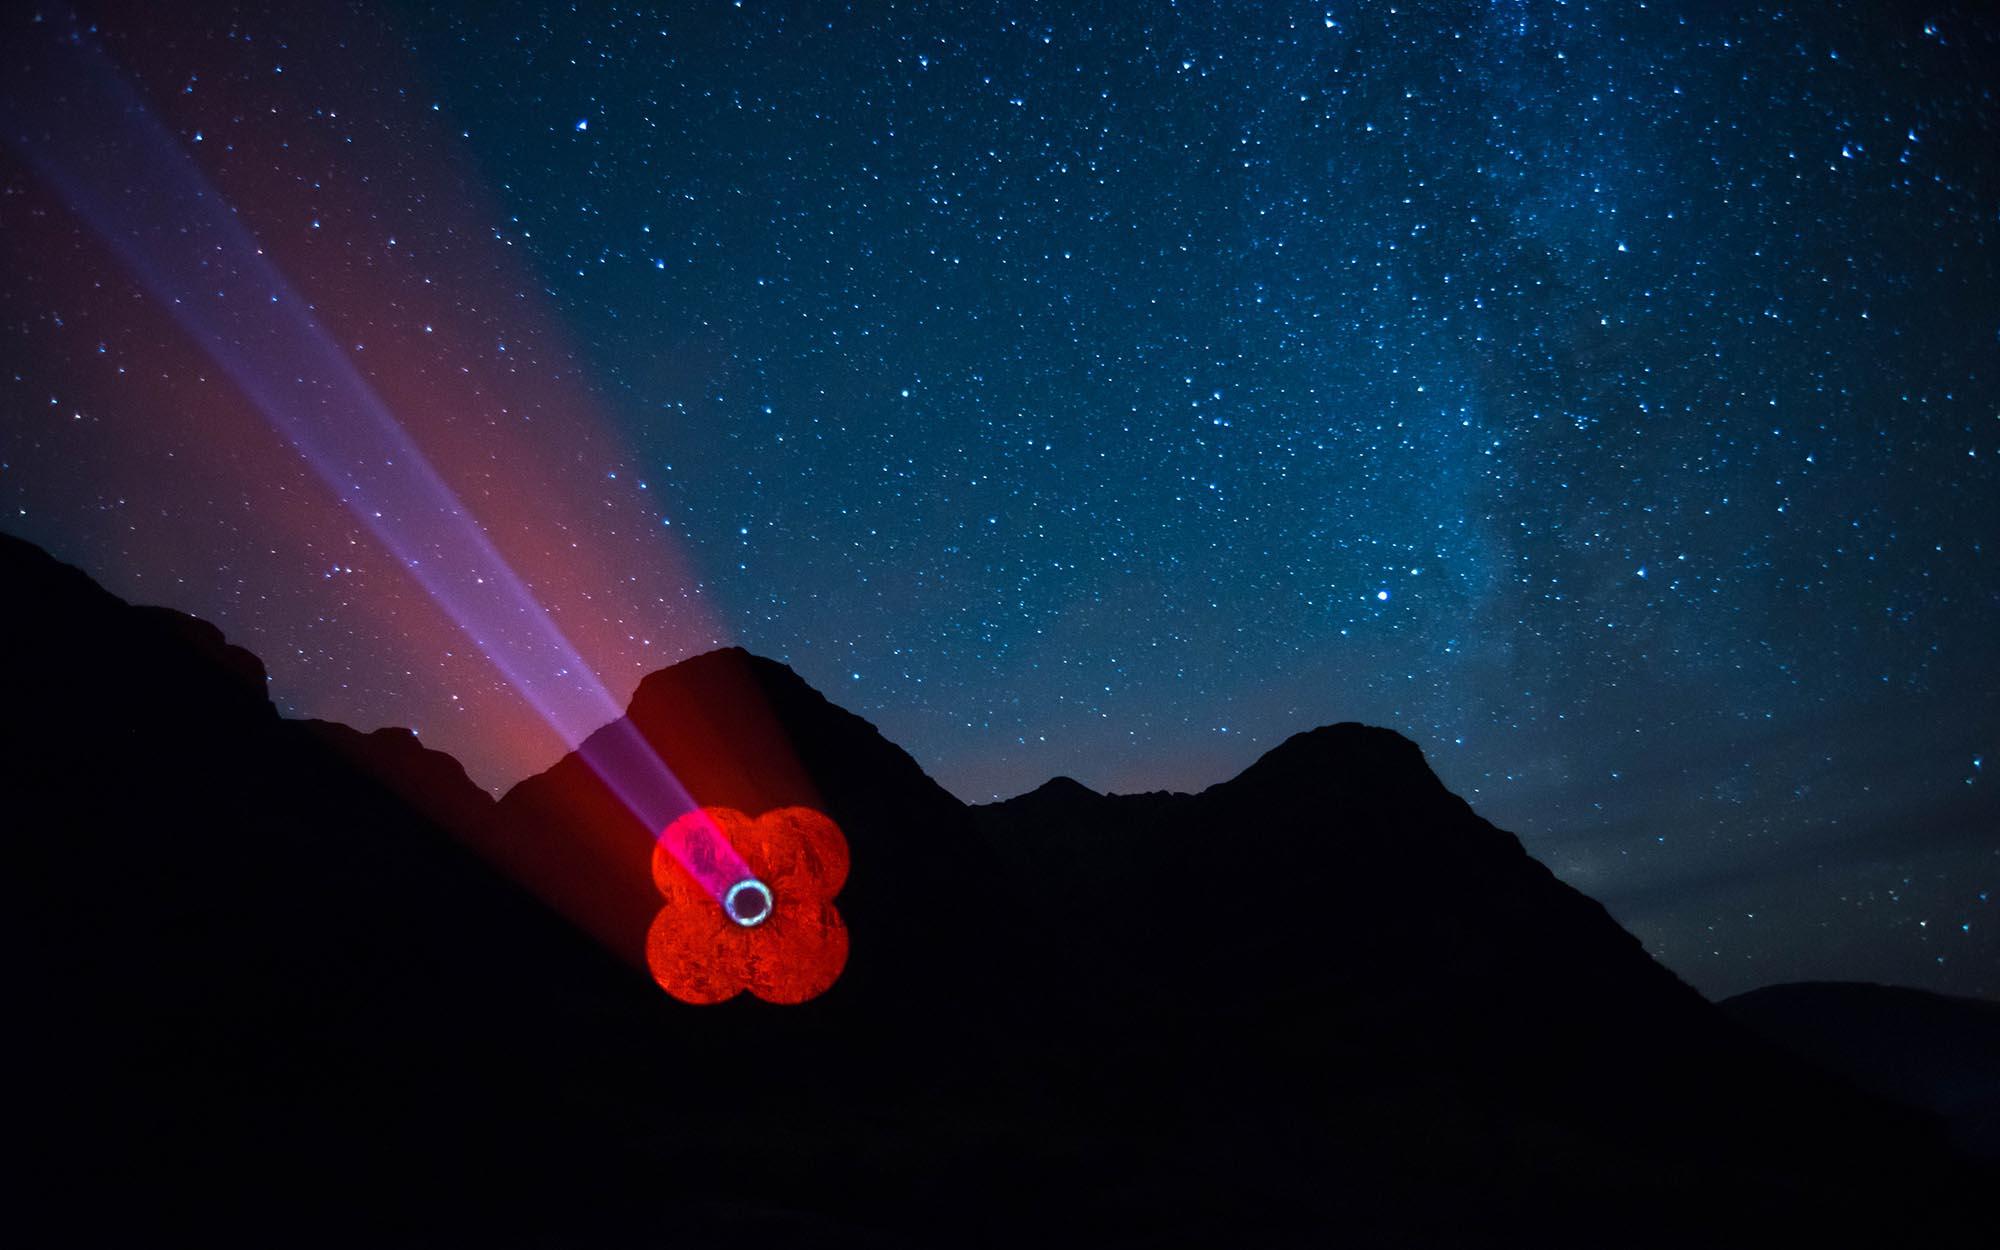 Poppy Scotland logo projected onto Mountain in Glencoe